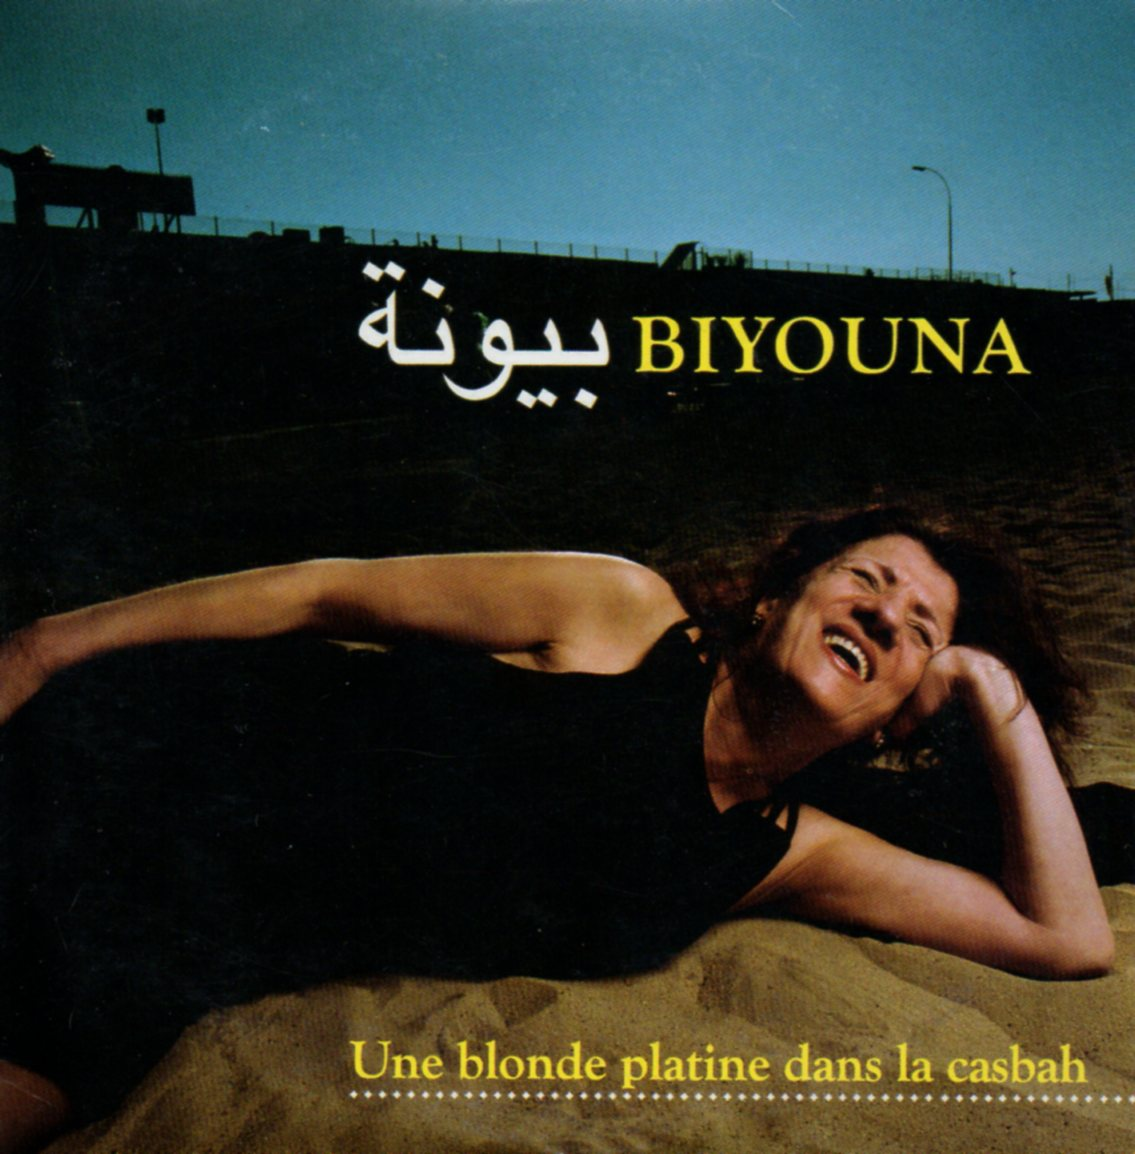 BIYOUNA - Une blonde platine dans la casbah 2-track CARD SLEEVE - CD single